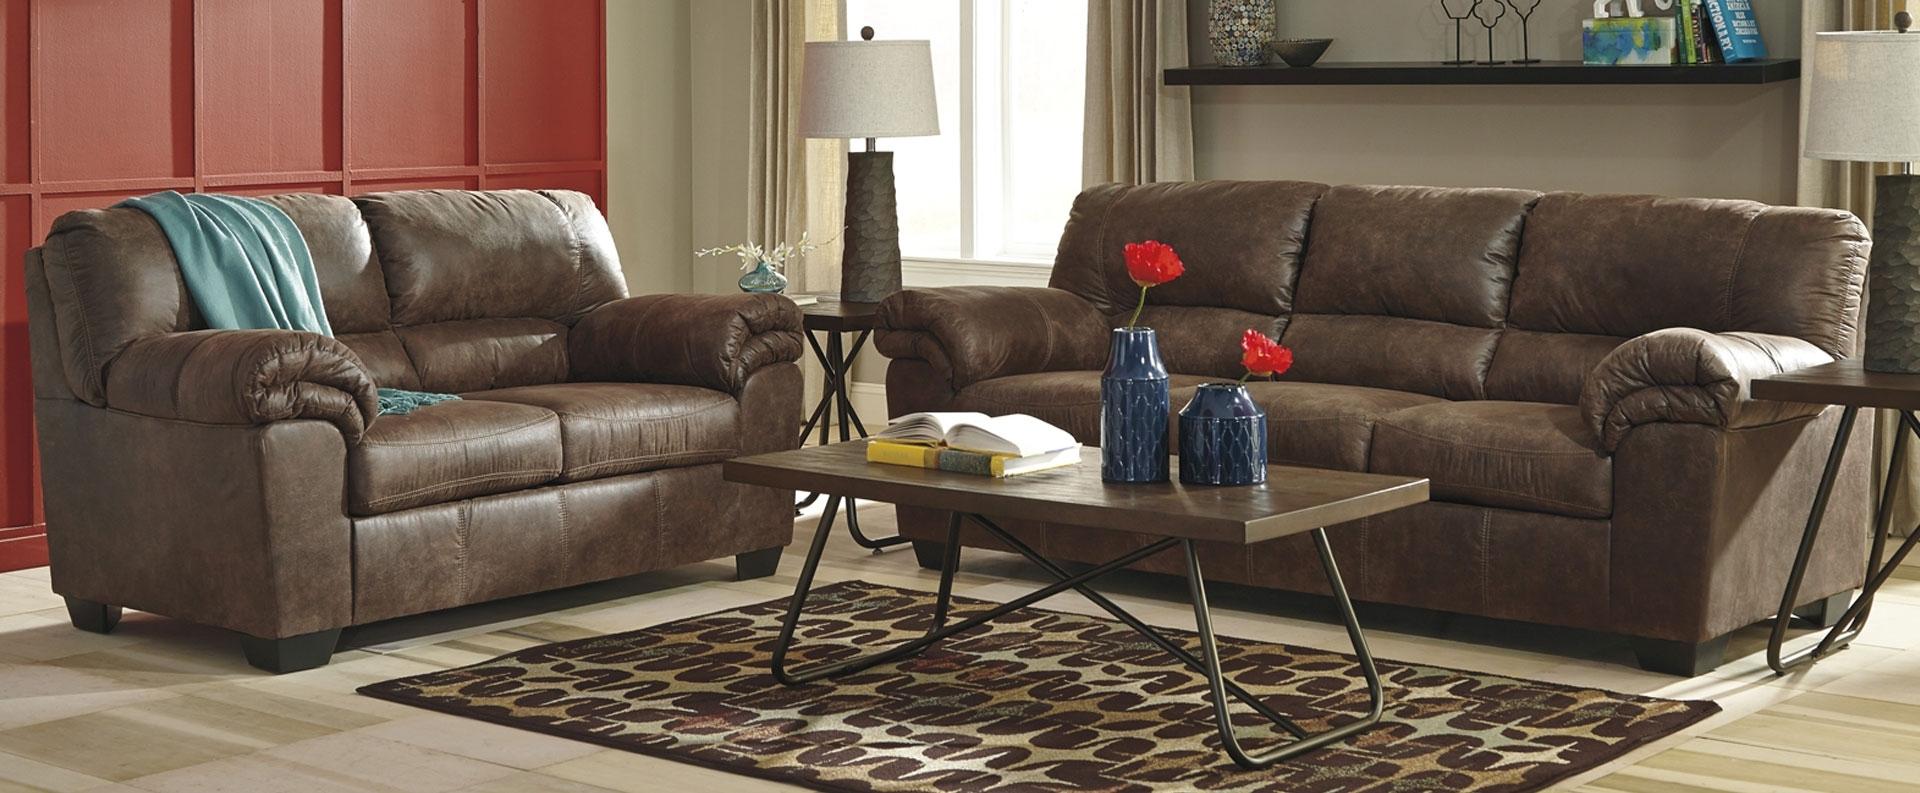 Sofar Worcester Furniture Stores In Ma Jordans Sectional Sofas with Jordans Sectional Sofas (Image 9 of 10)